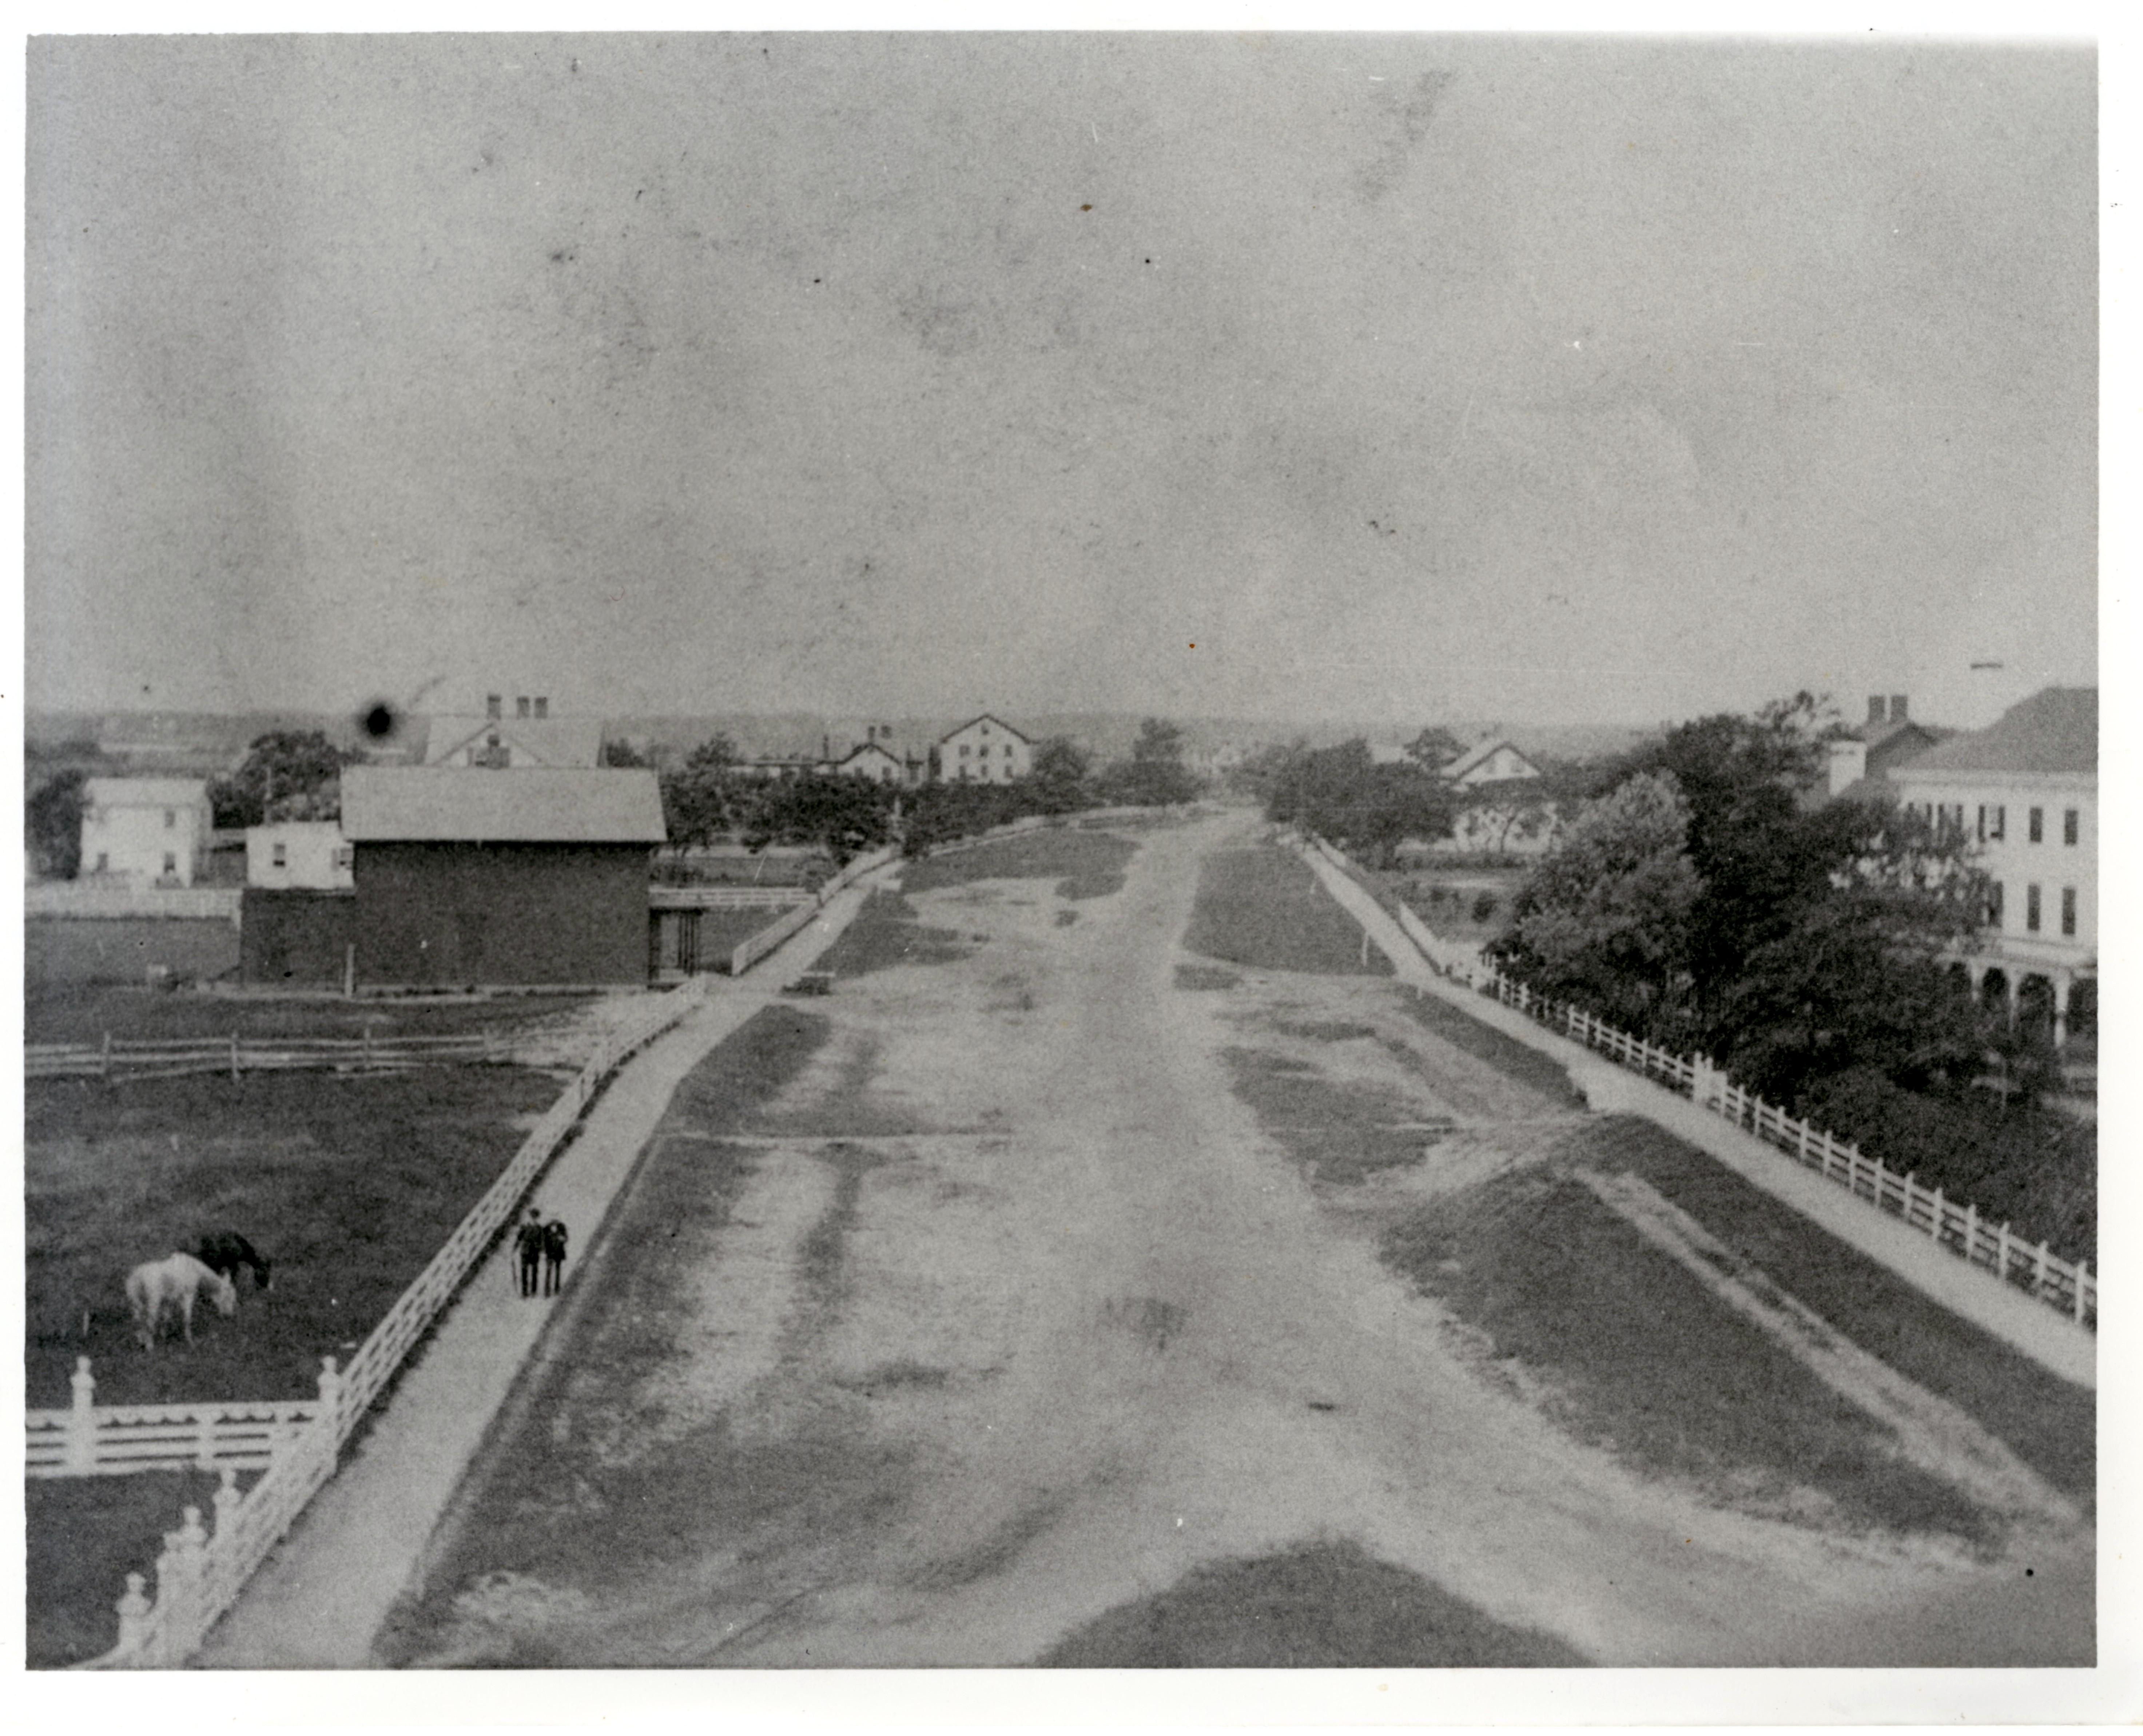 Quogue Street, ca. 1905